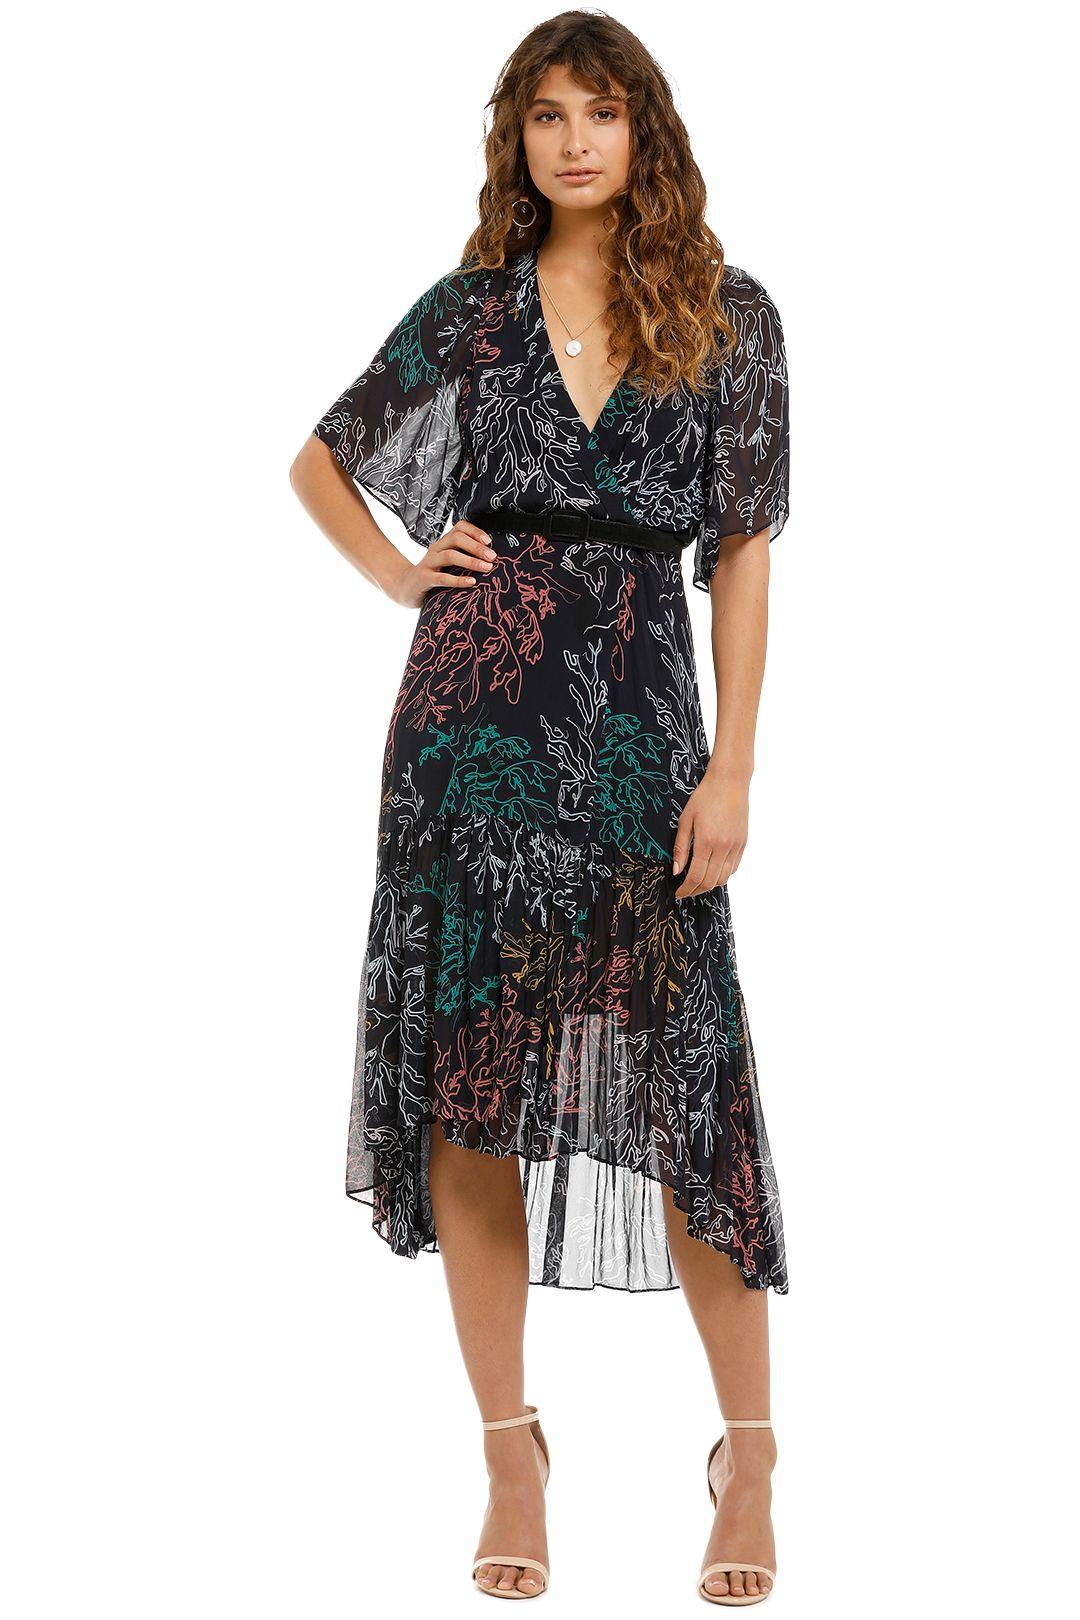 Ginger and Smart - Illustrate Wrap Dress - Black Print - Front